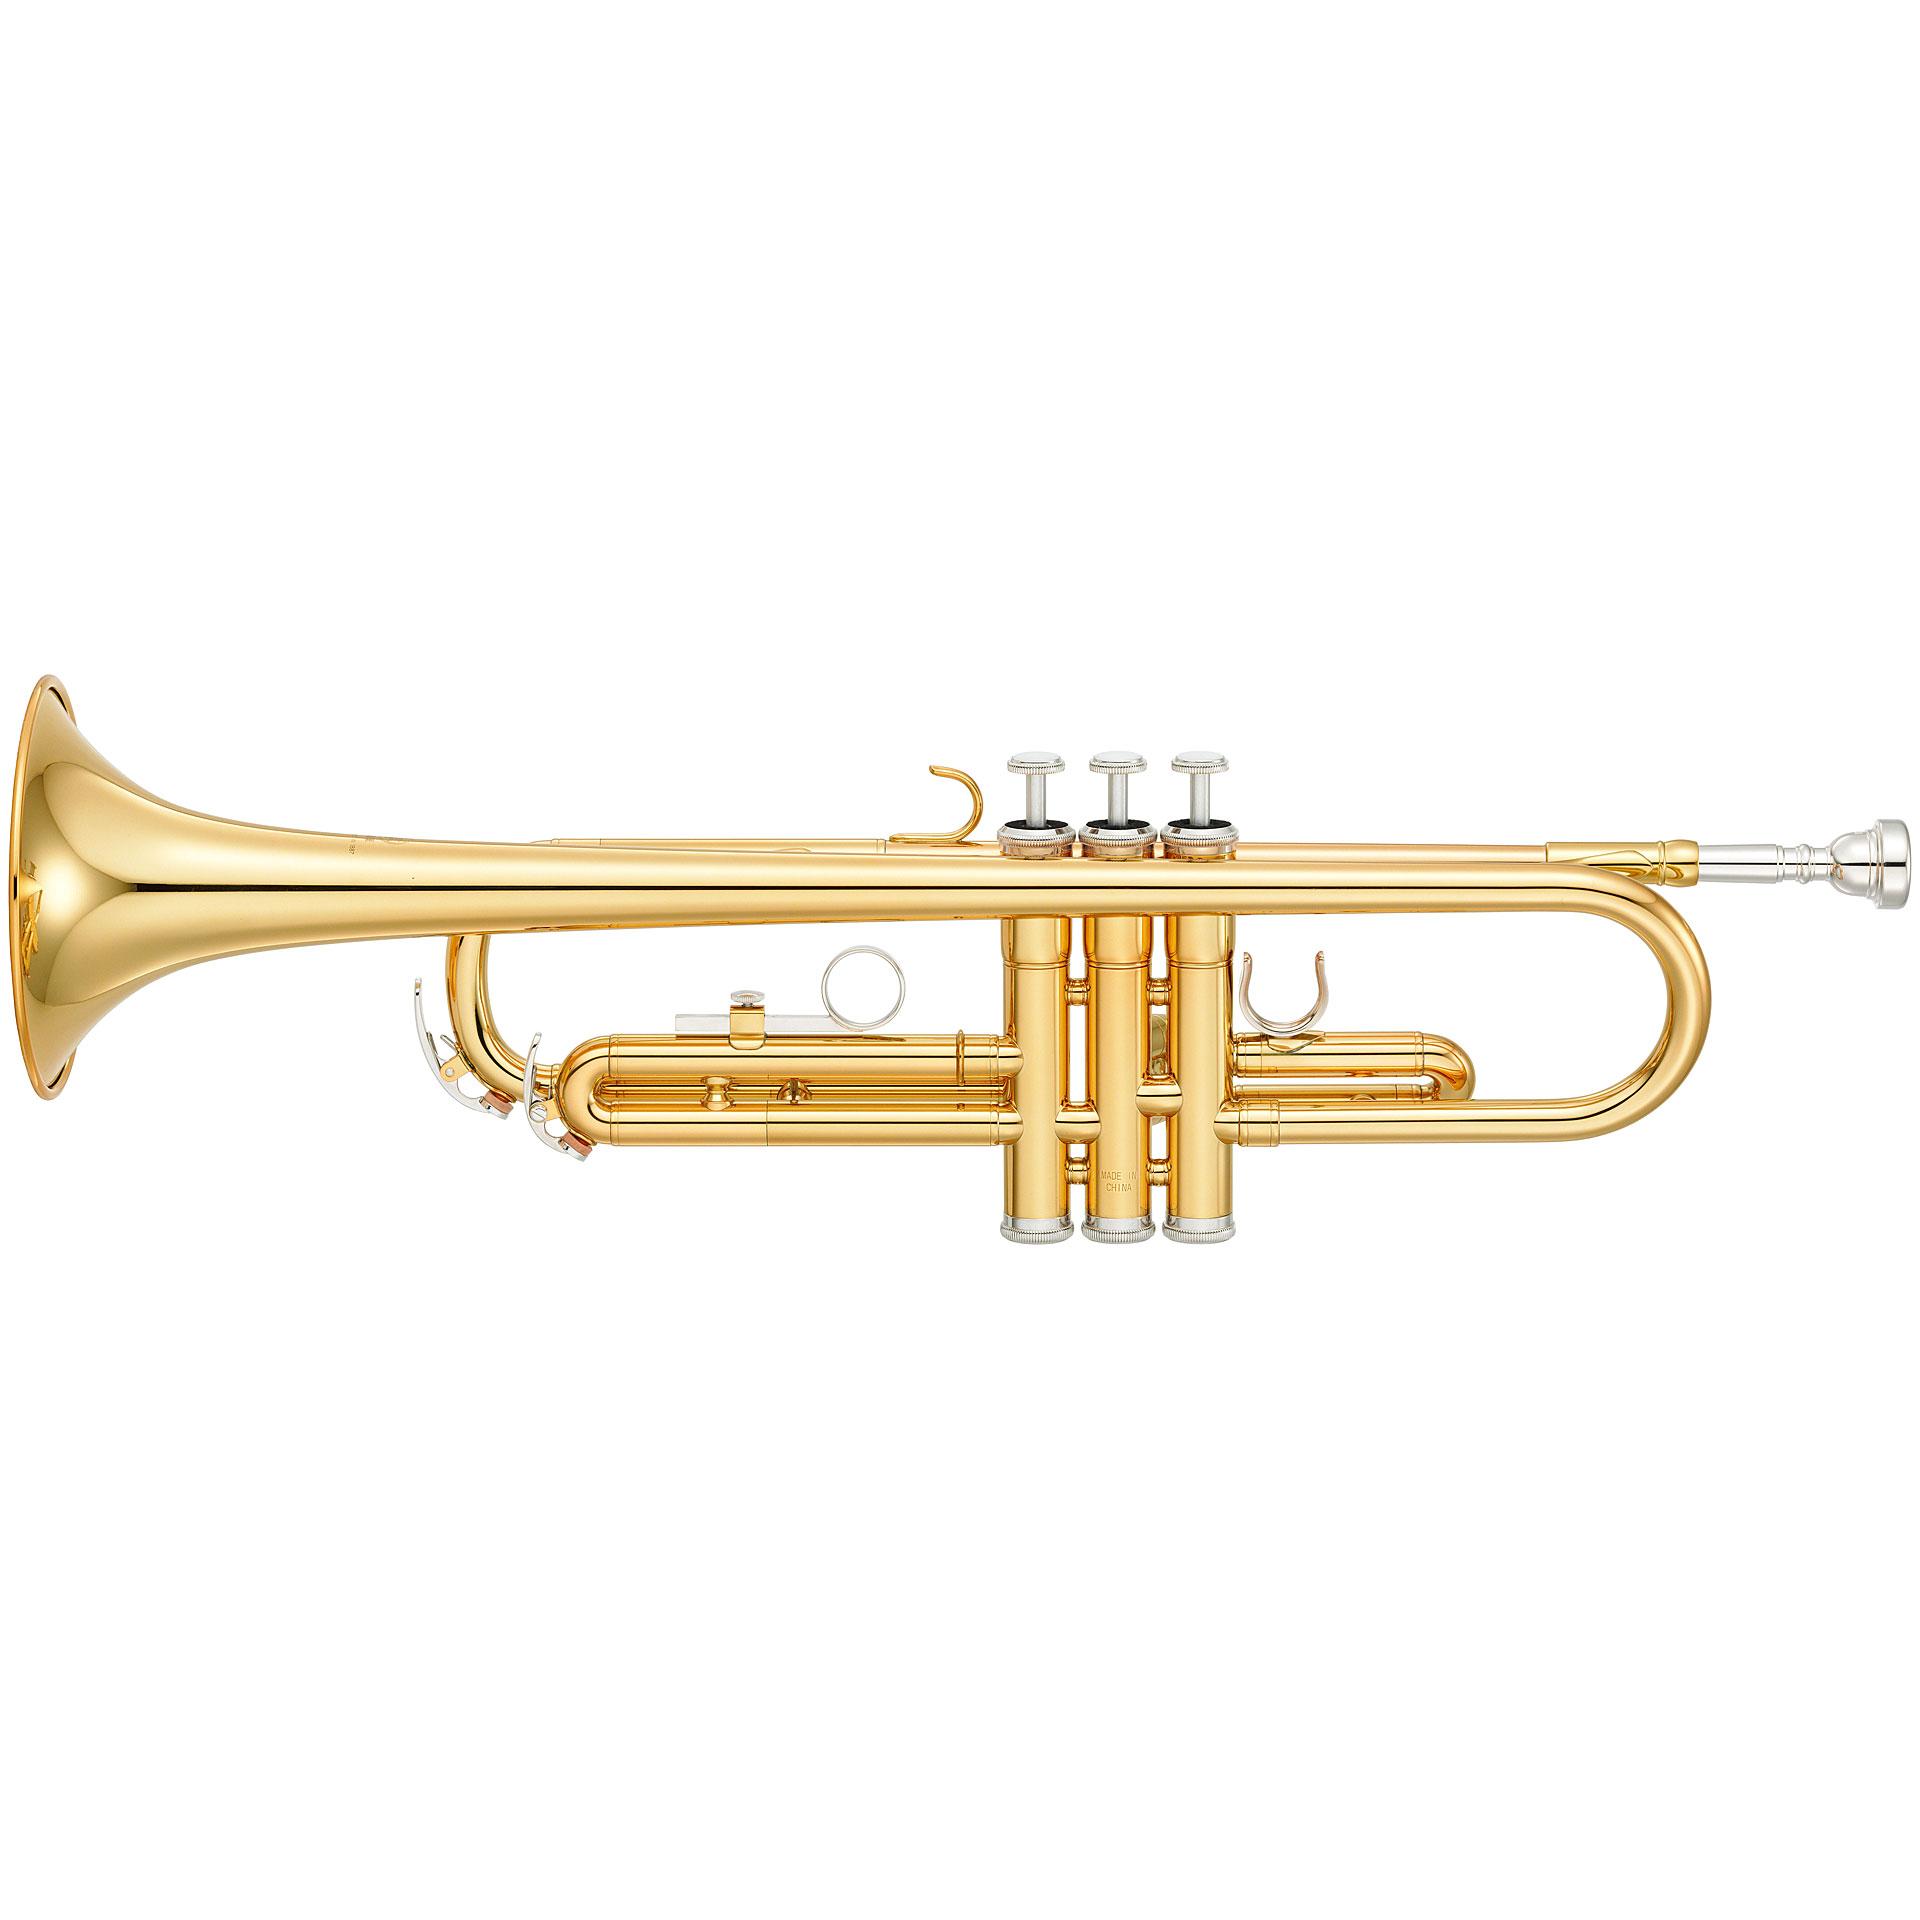 yamaha ytr 2330 perinet trumpet. Black Bedroom Furniture Sets. Home Design Ideas